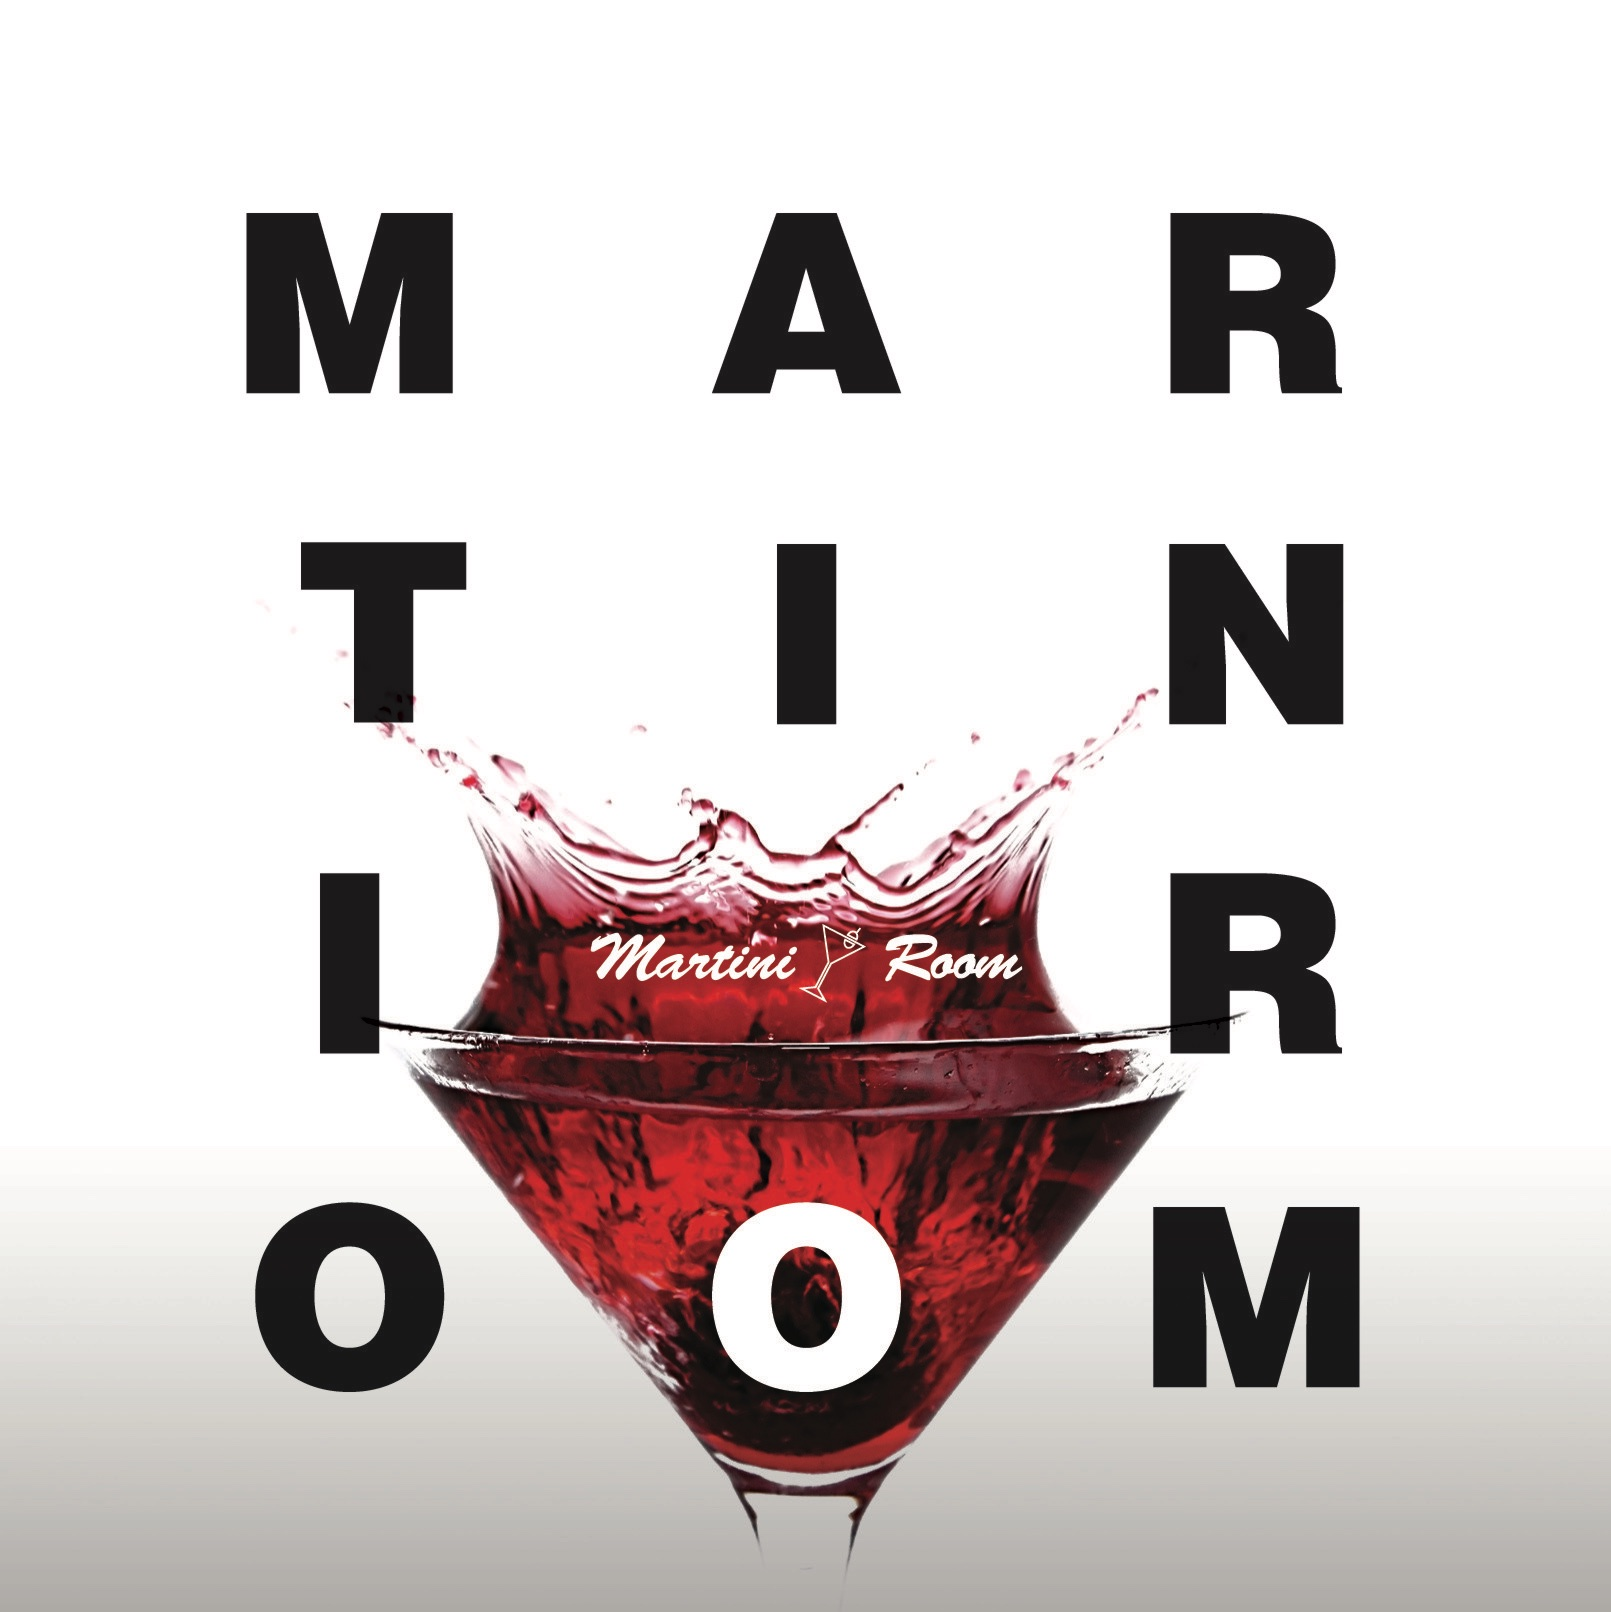 Martini Room Downtown Elgin